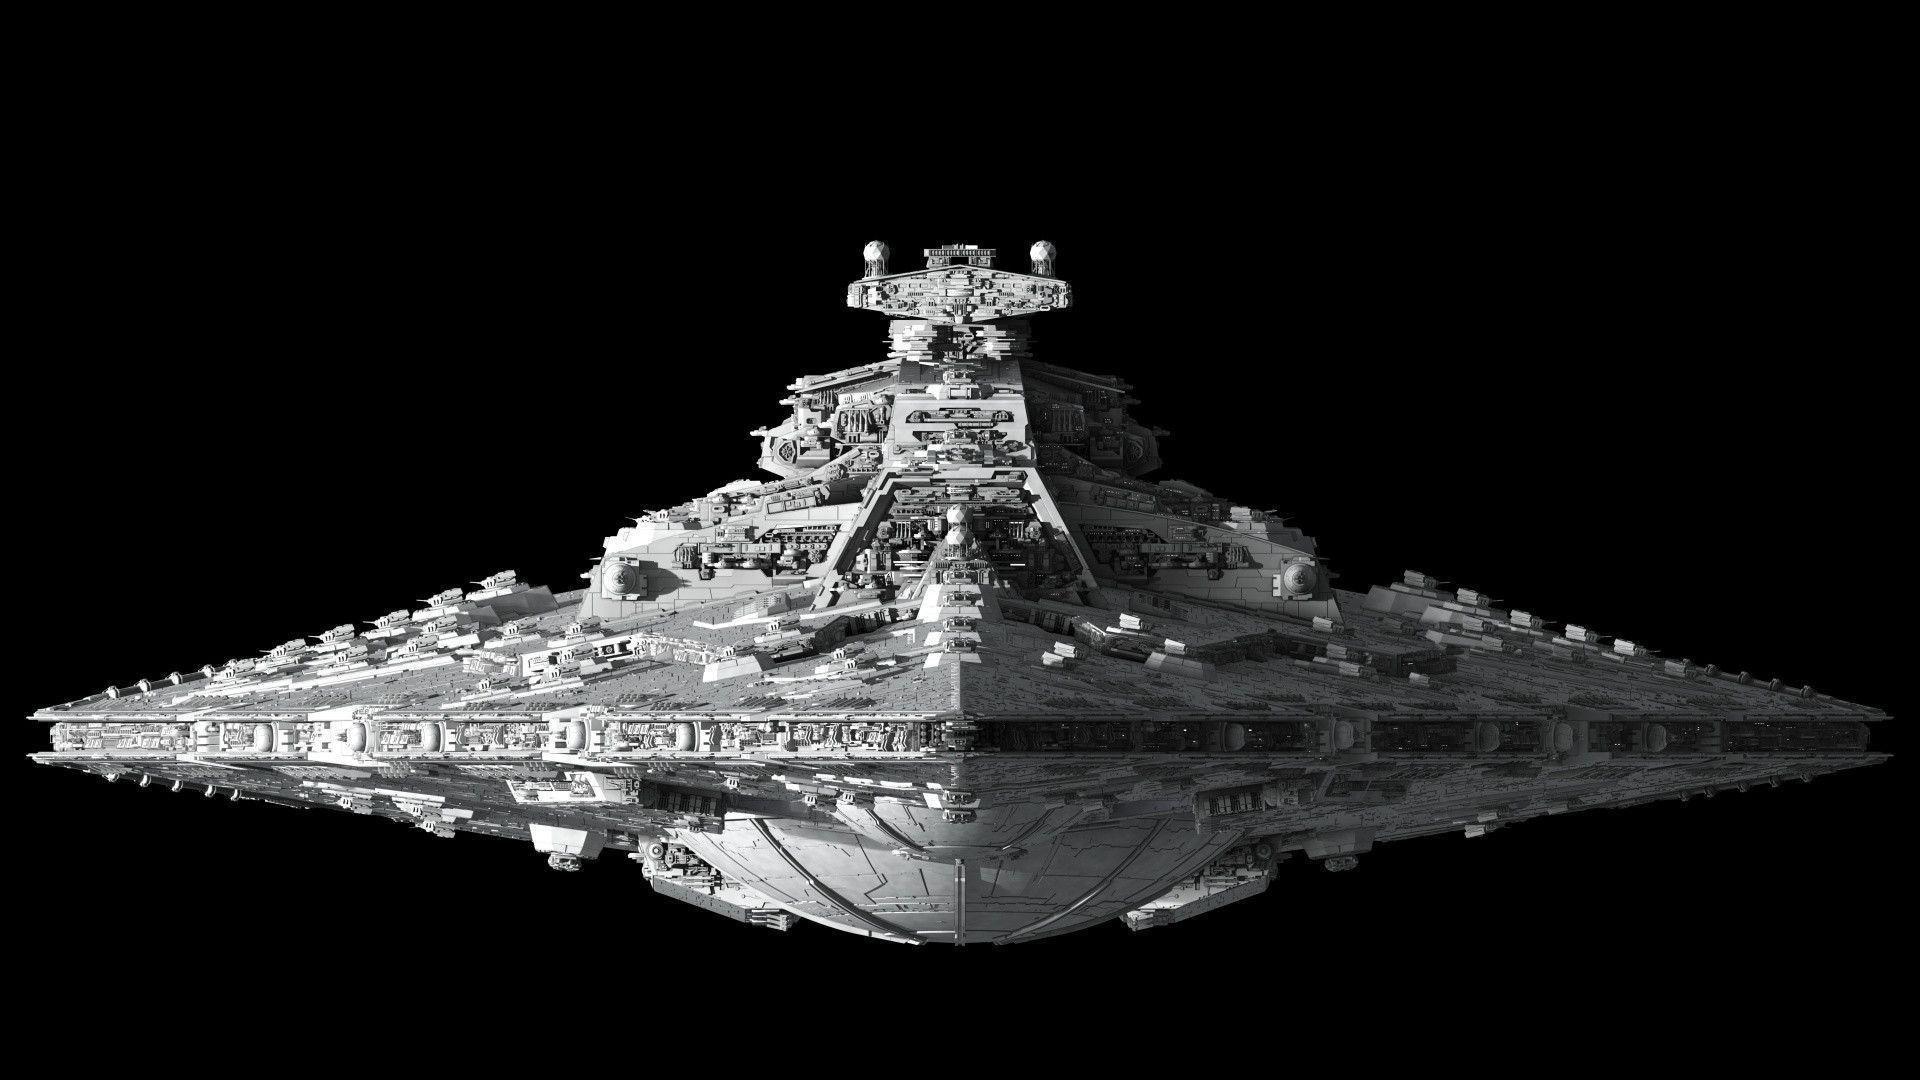 Wallpaper Hd 1080p Black And White Star Wars Tuffboys Com Star Destroyer Wallpaper Star Wars Wallpaper Star Wars Ships